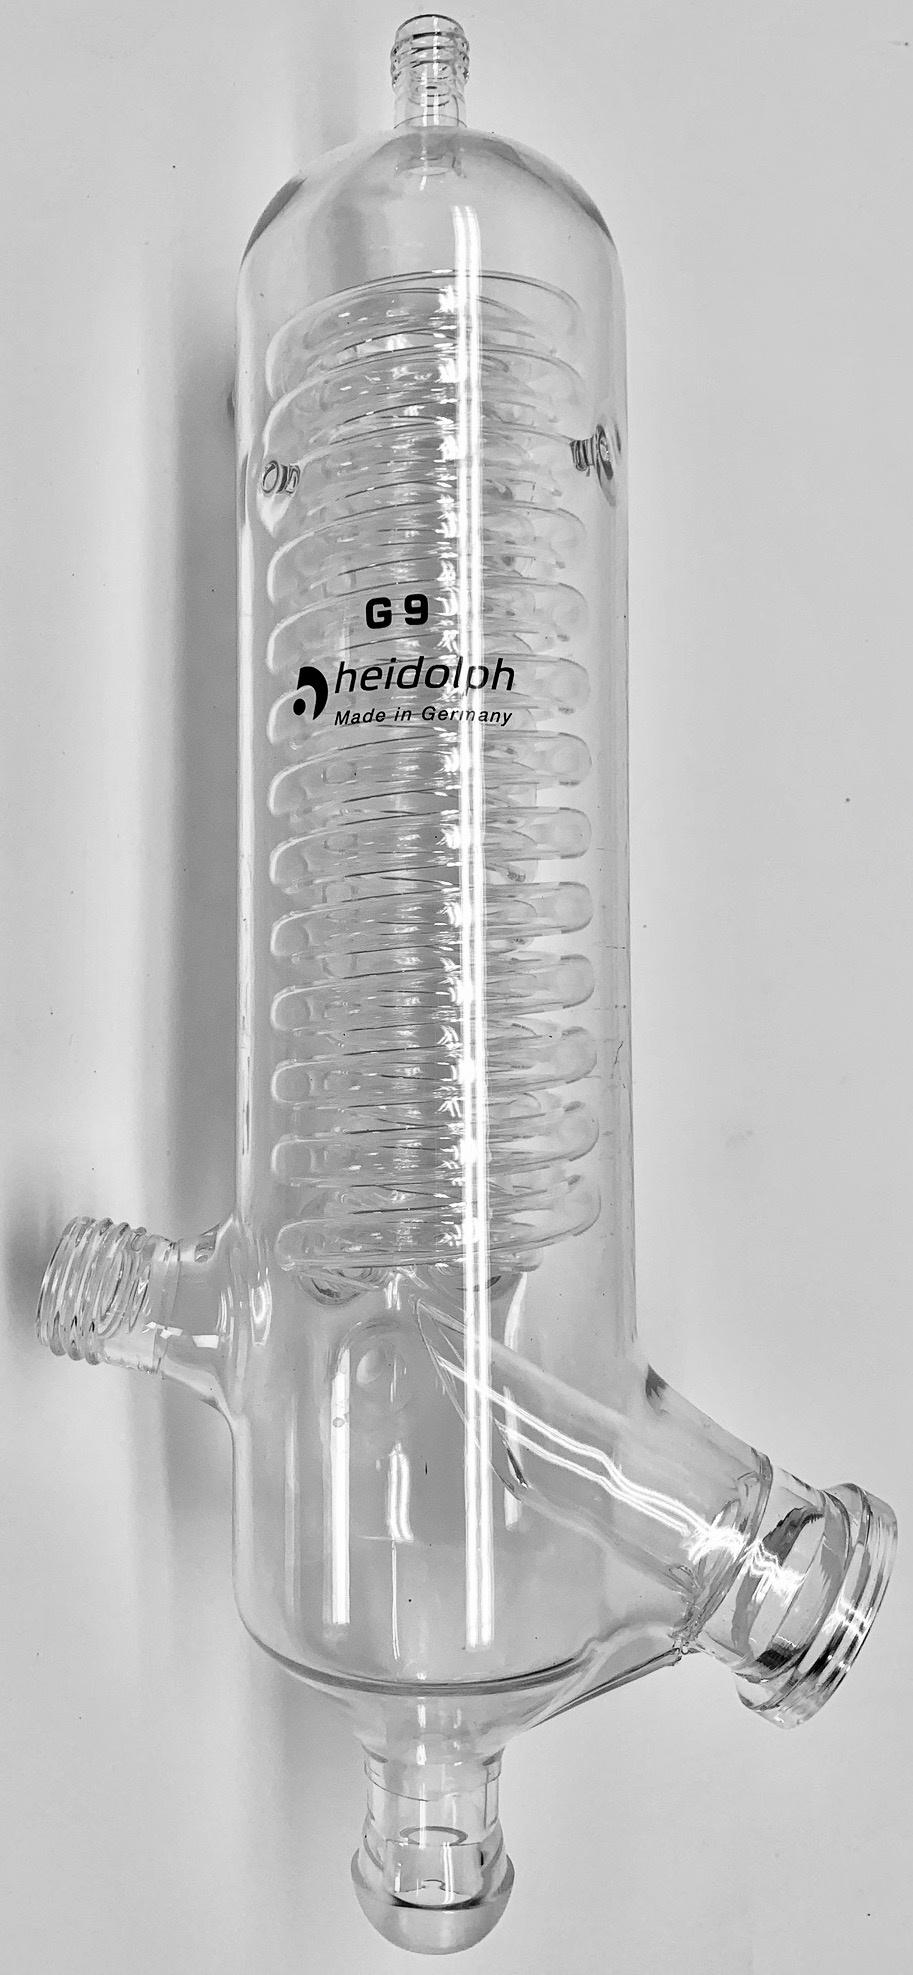 Heidolph Instruments Heidolph G9B Diagonalkühler